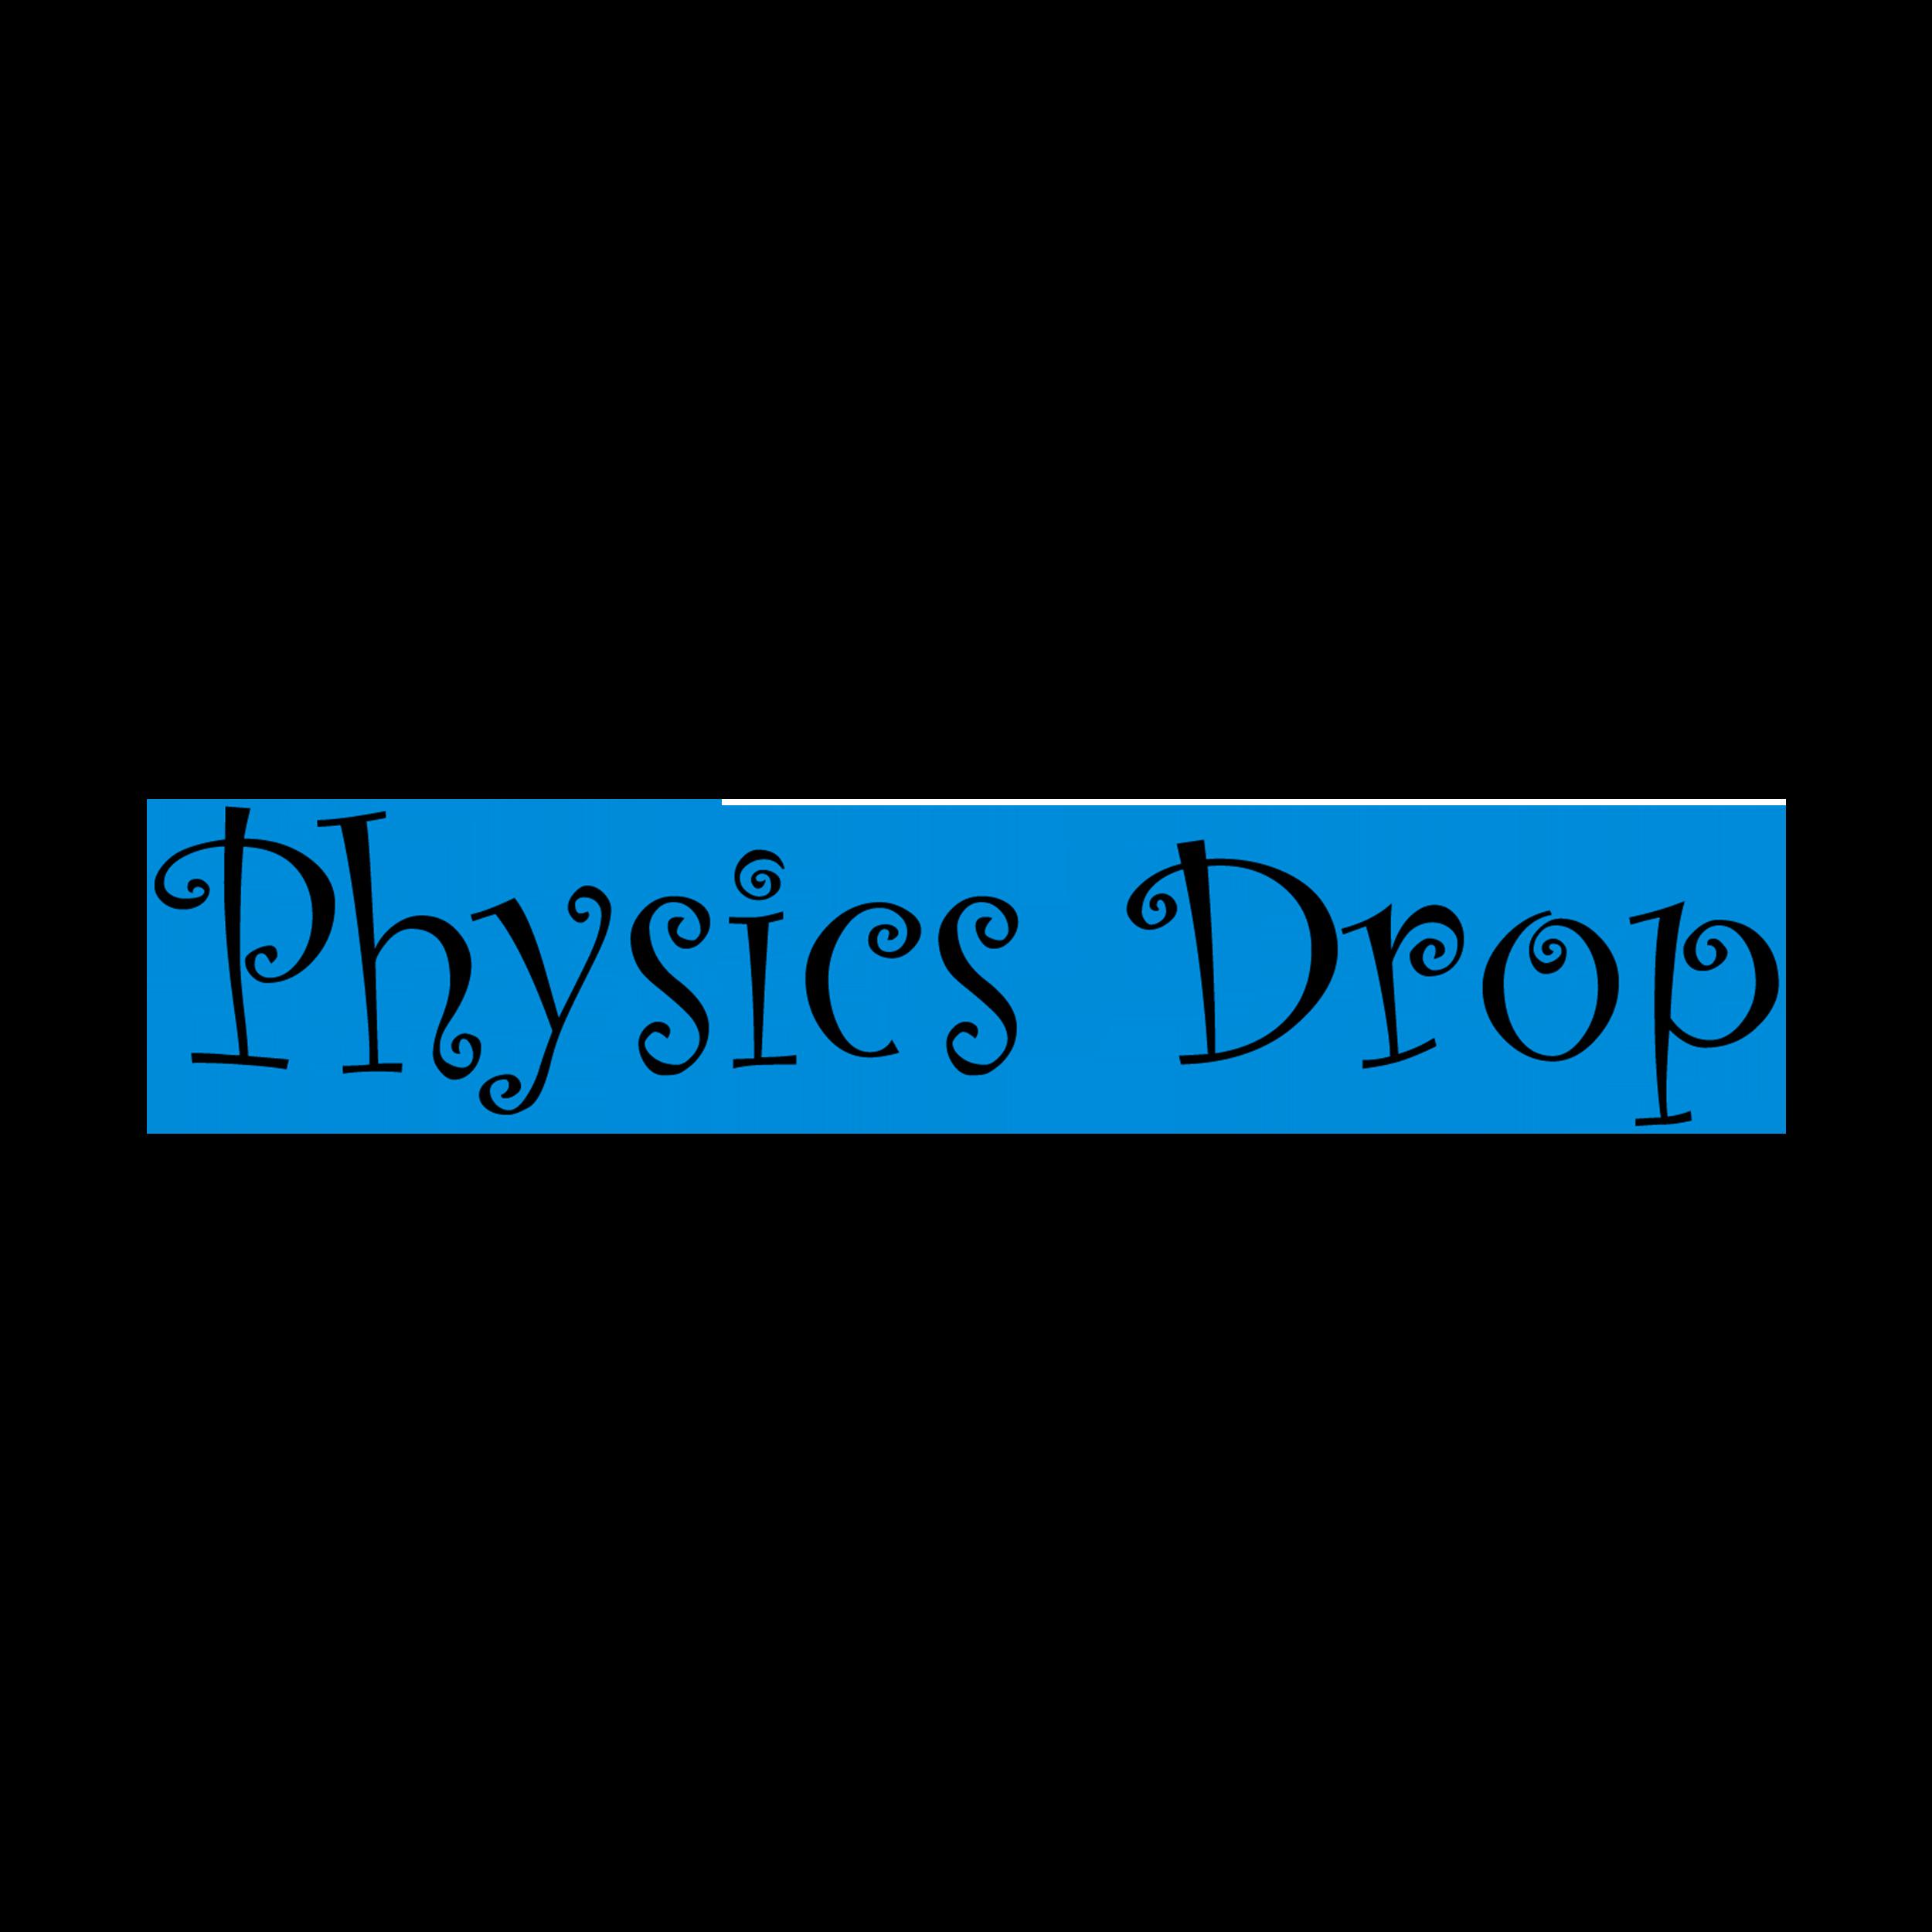 Physics Drop logo